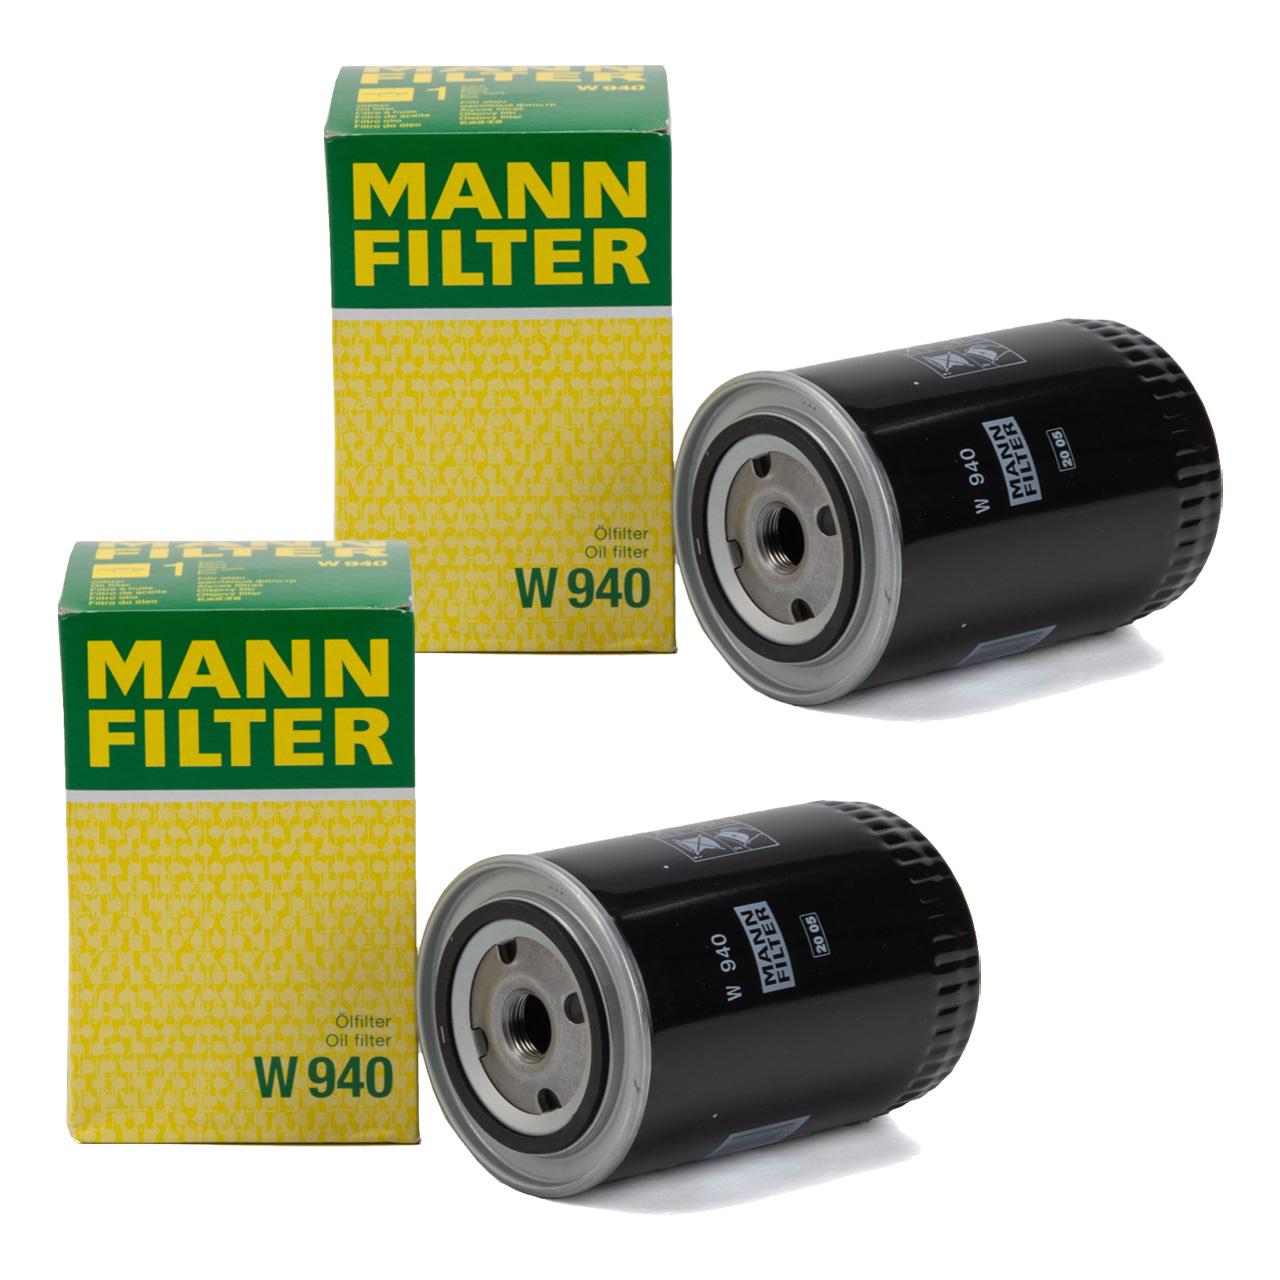 2x MANN W940 Ölfilter Motorölfilter für FENDT Farmer Favorit GT DEUTZ JOHN DEERE